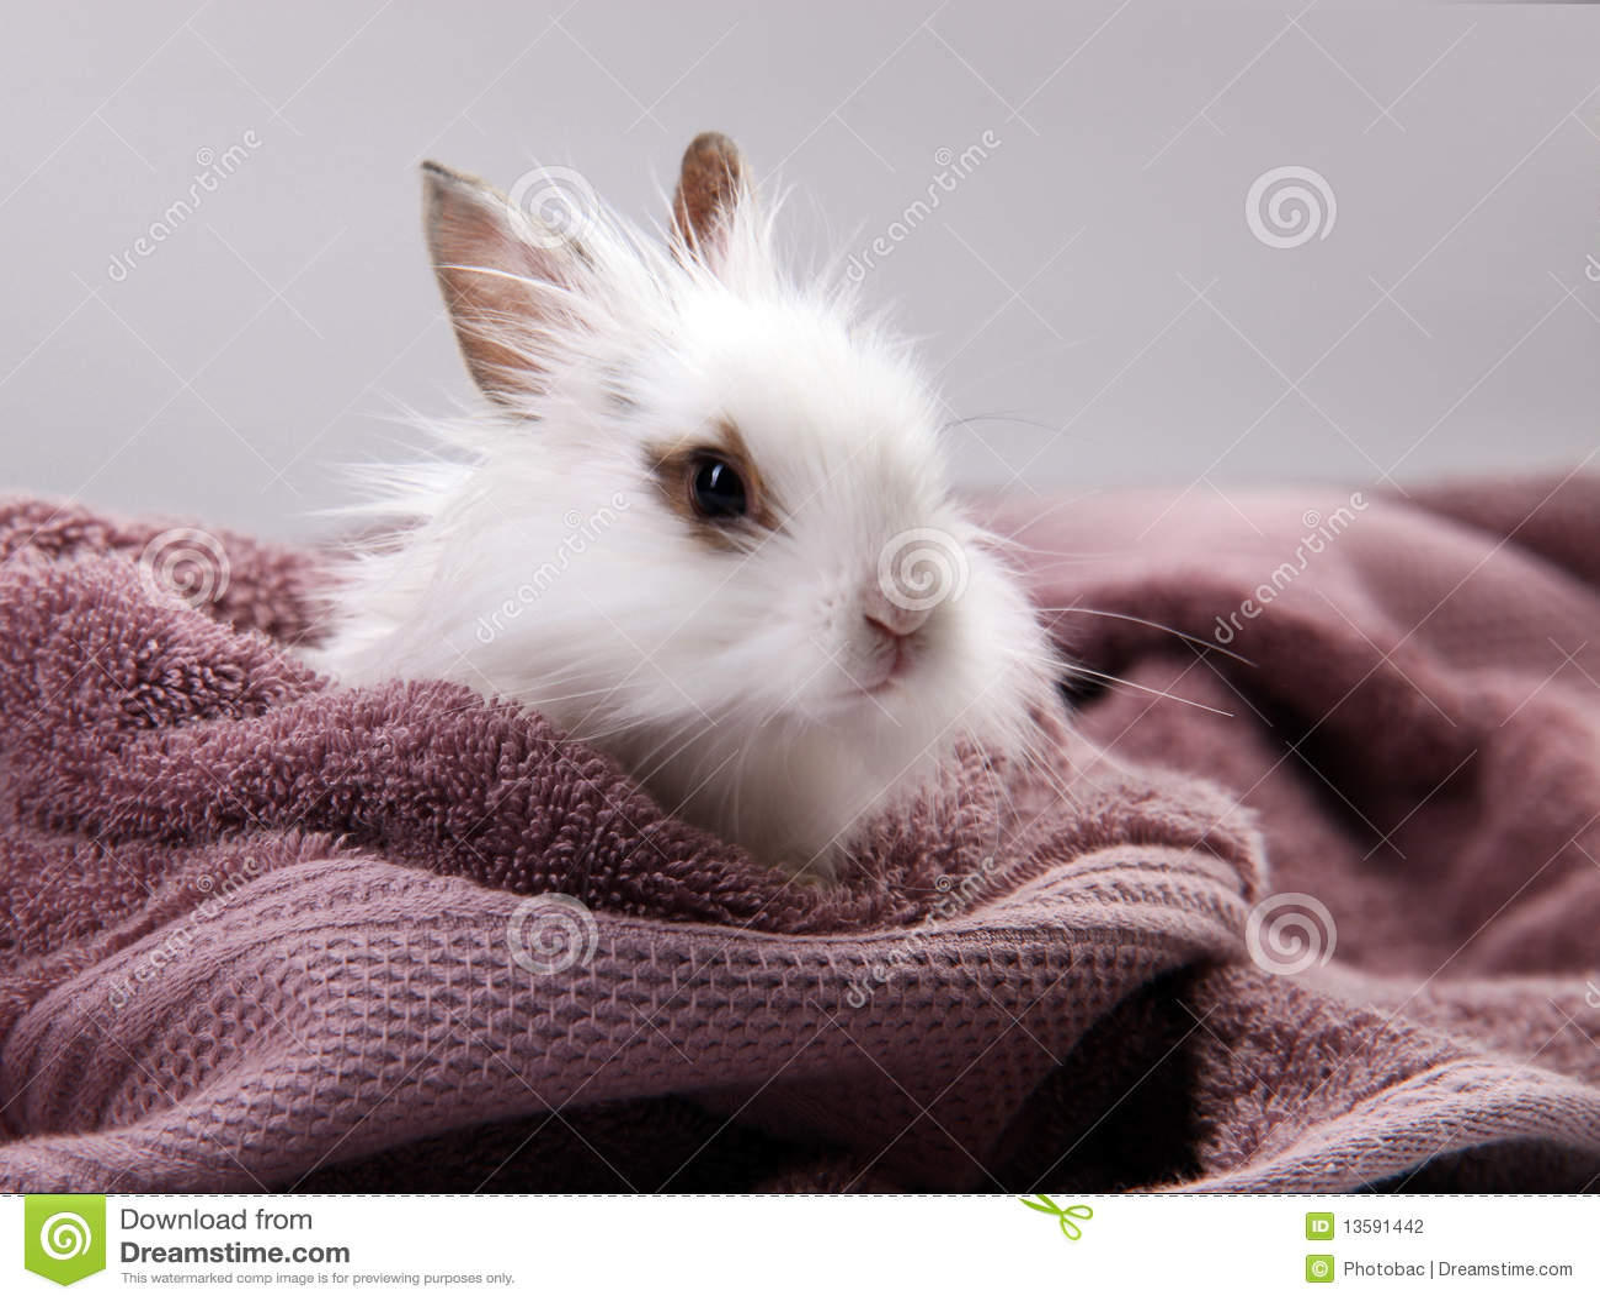 White Domestic Rabbit Nestled in Violet Bath Towel